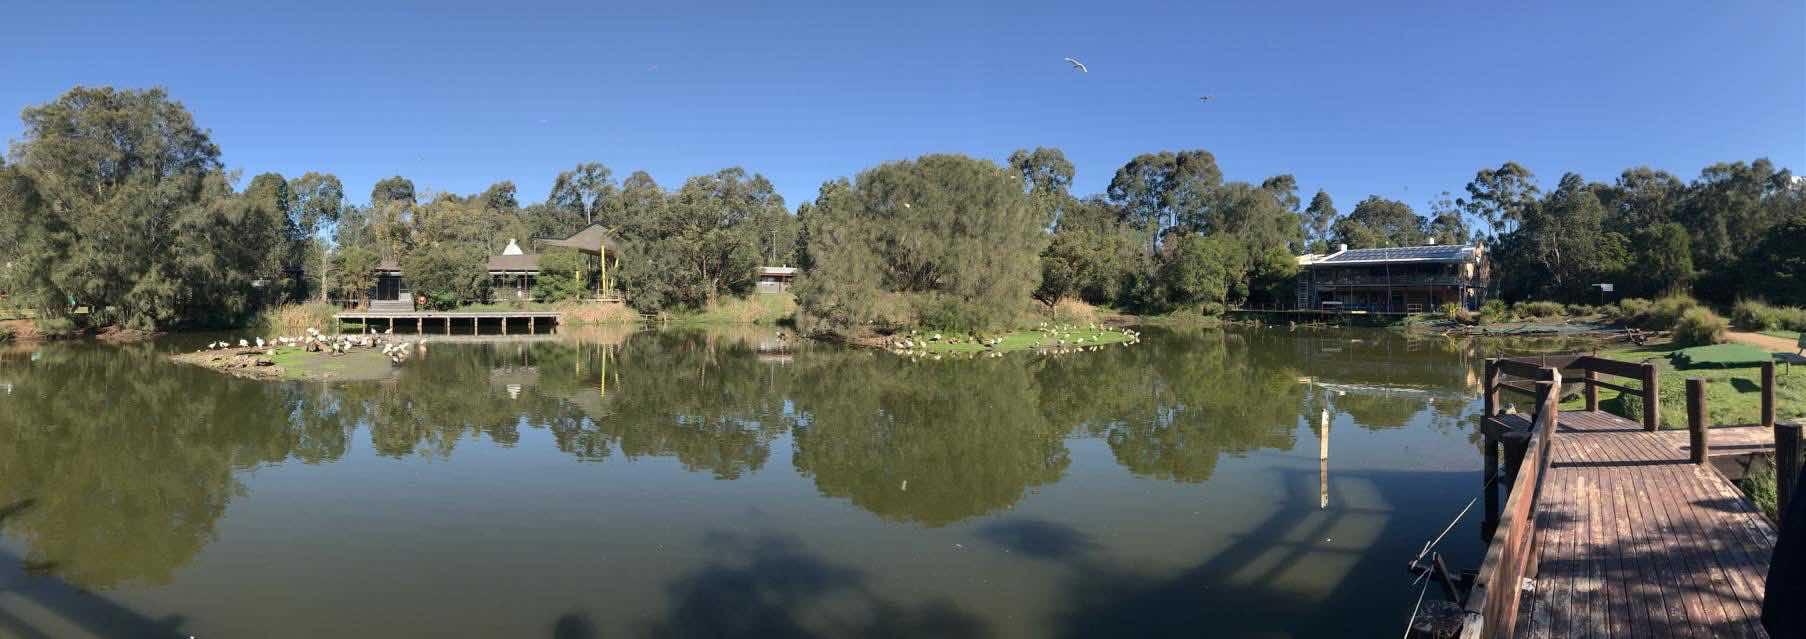 Hunter wetland centre